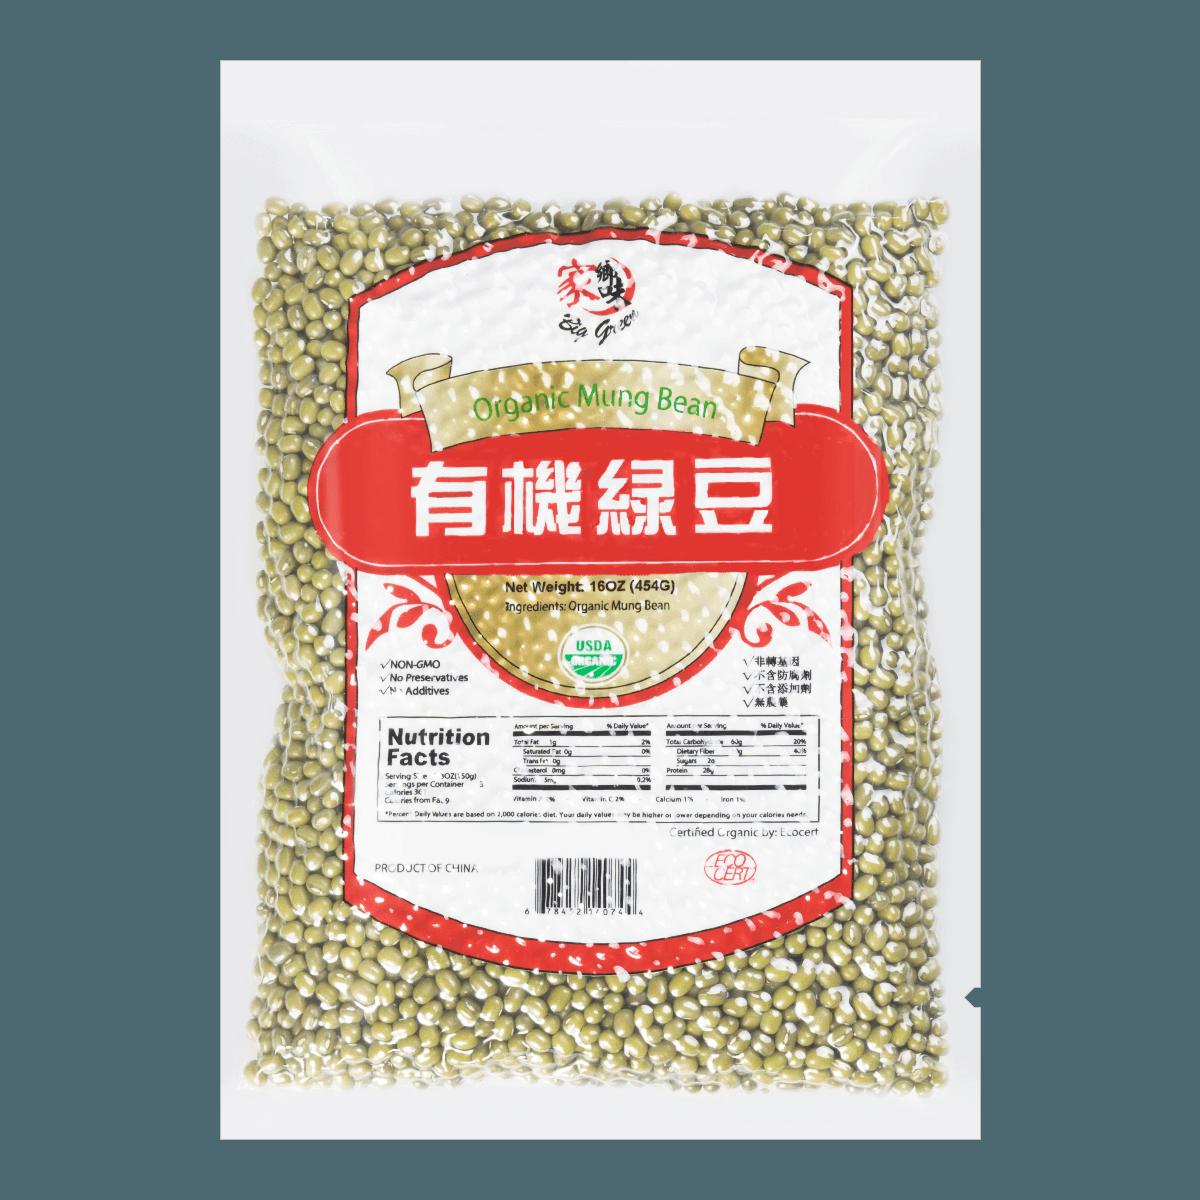 BIG GREEN Organic Mung Beans 454g USDA